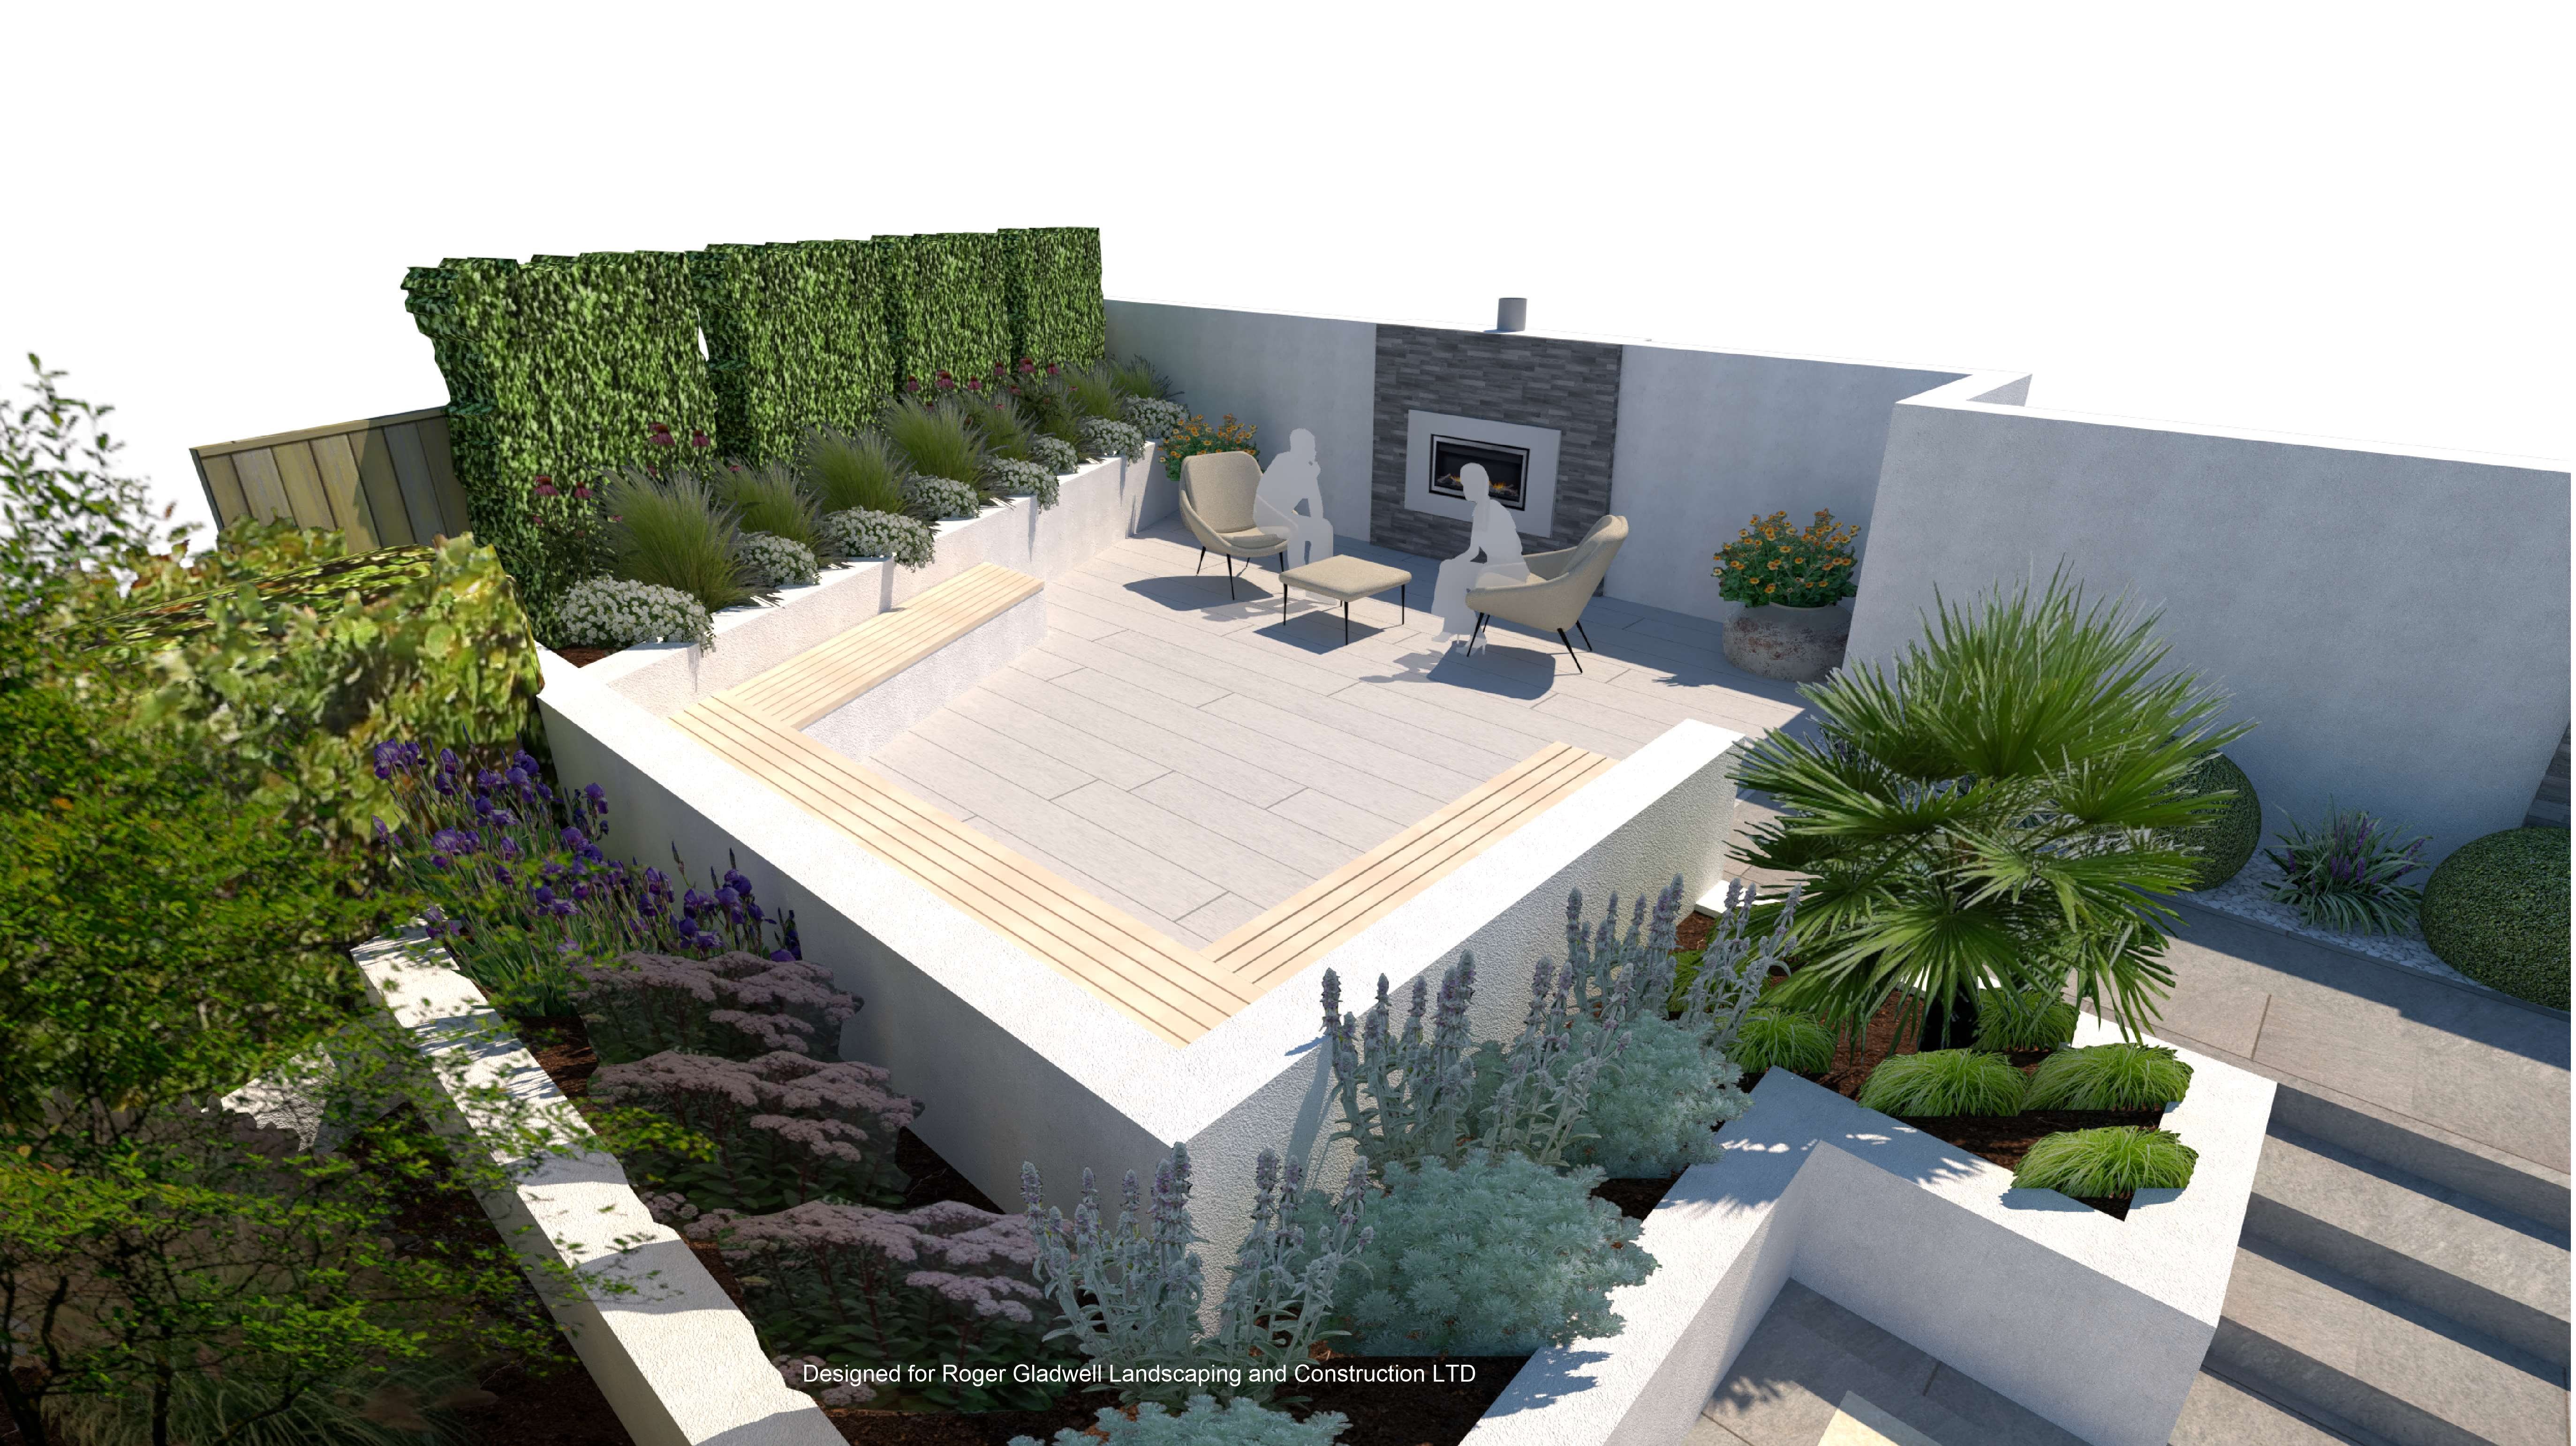 Camilla Jousiffe Garden Design